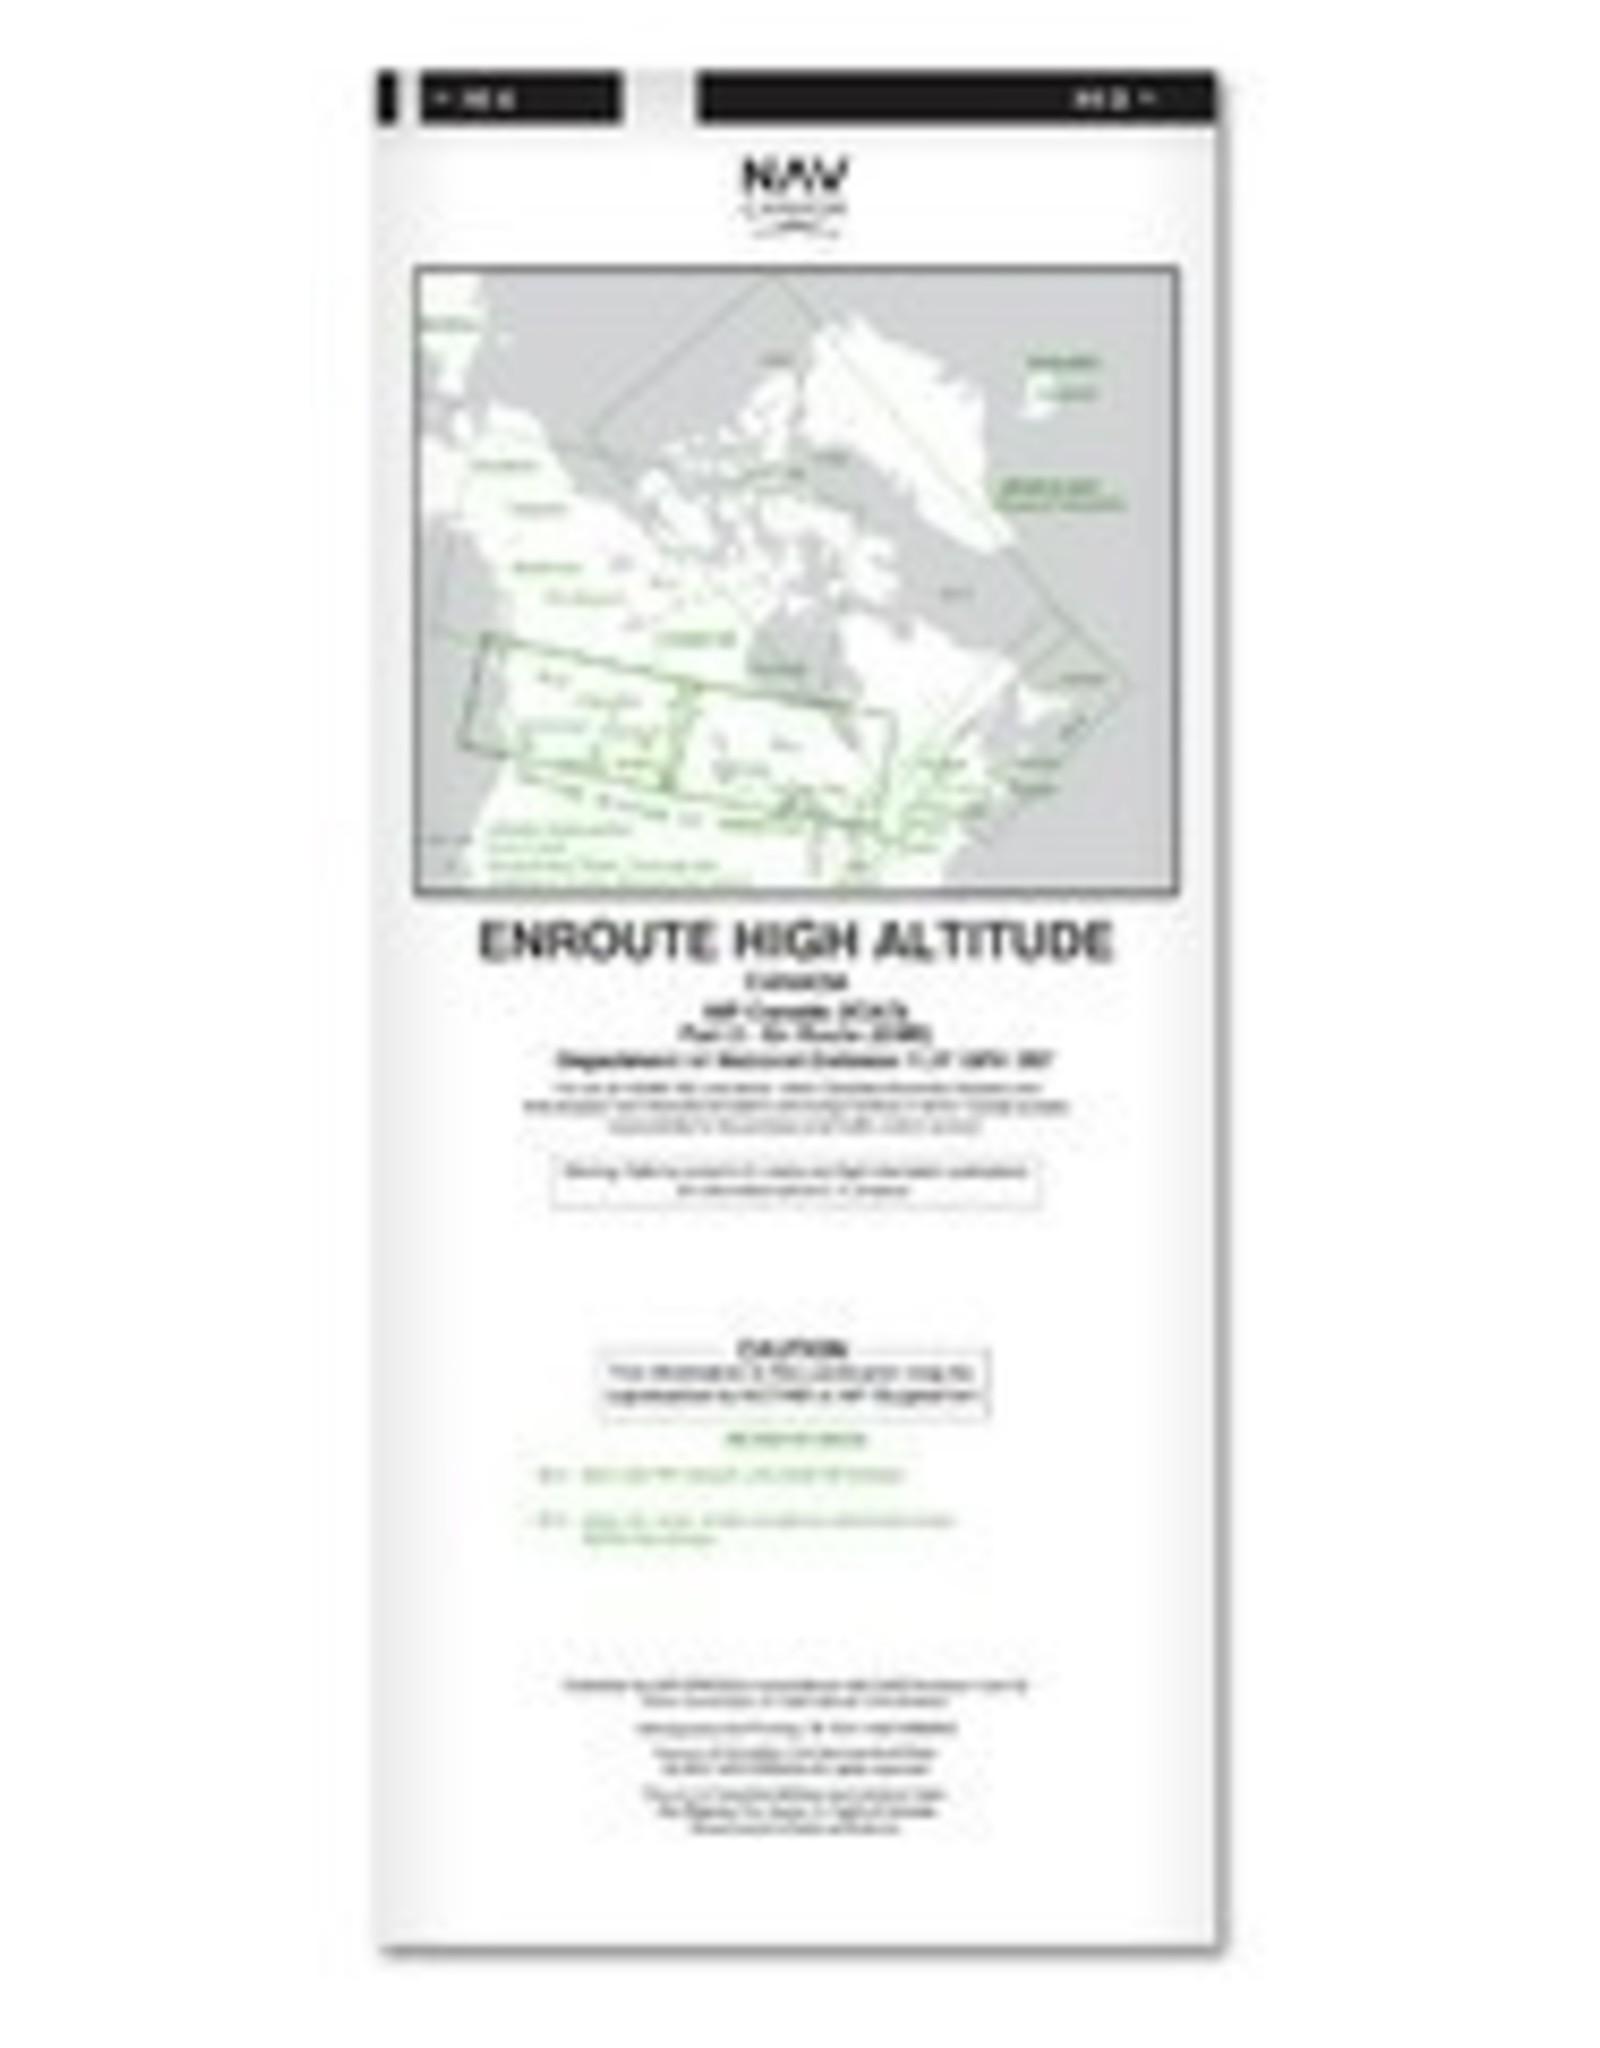 HI 3/4 Enroute High Altitude - Oct 7, 21 to Dec 2, 21